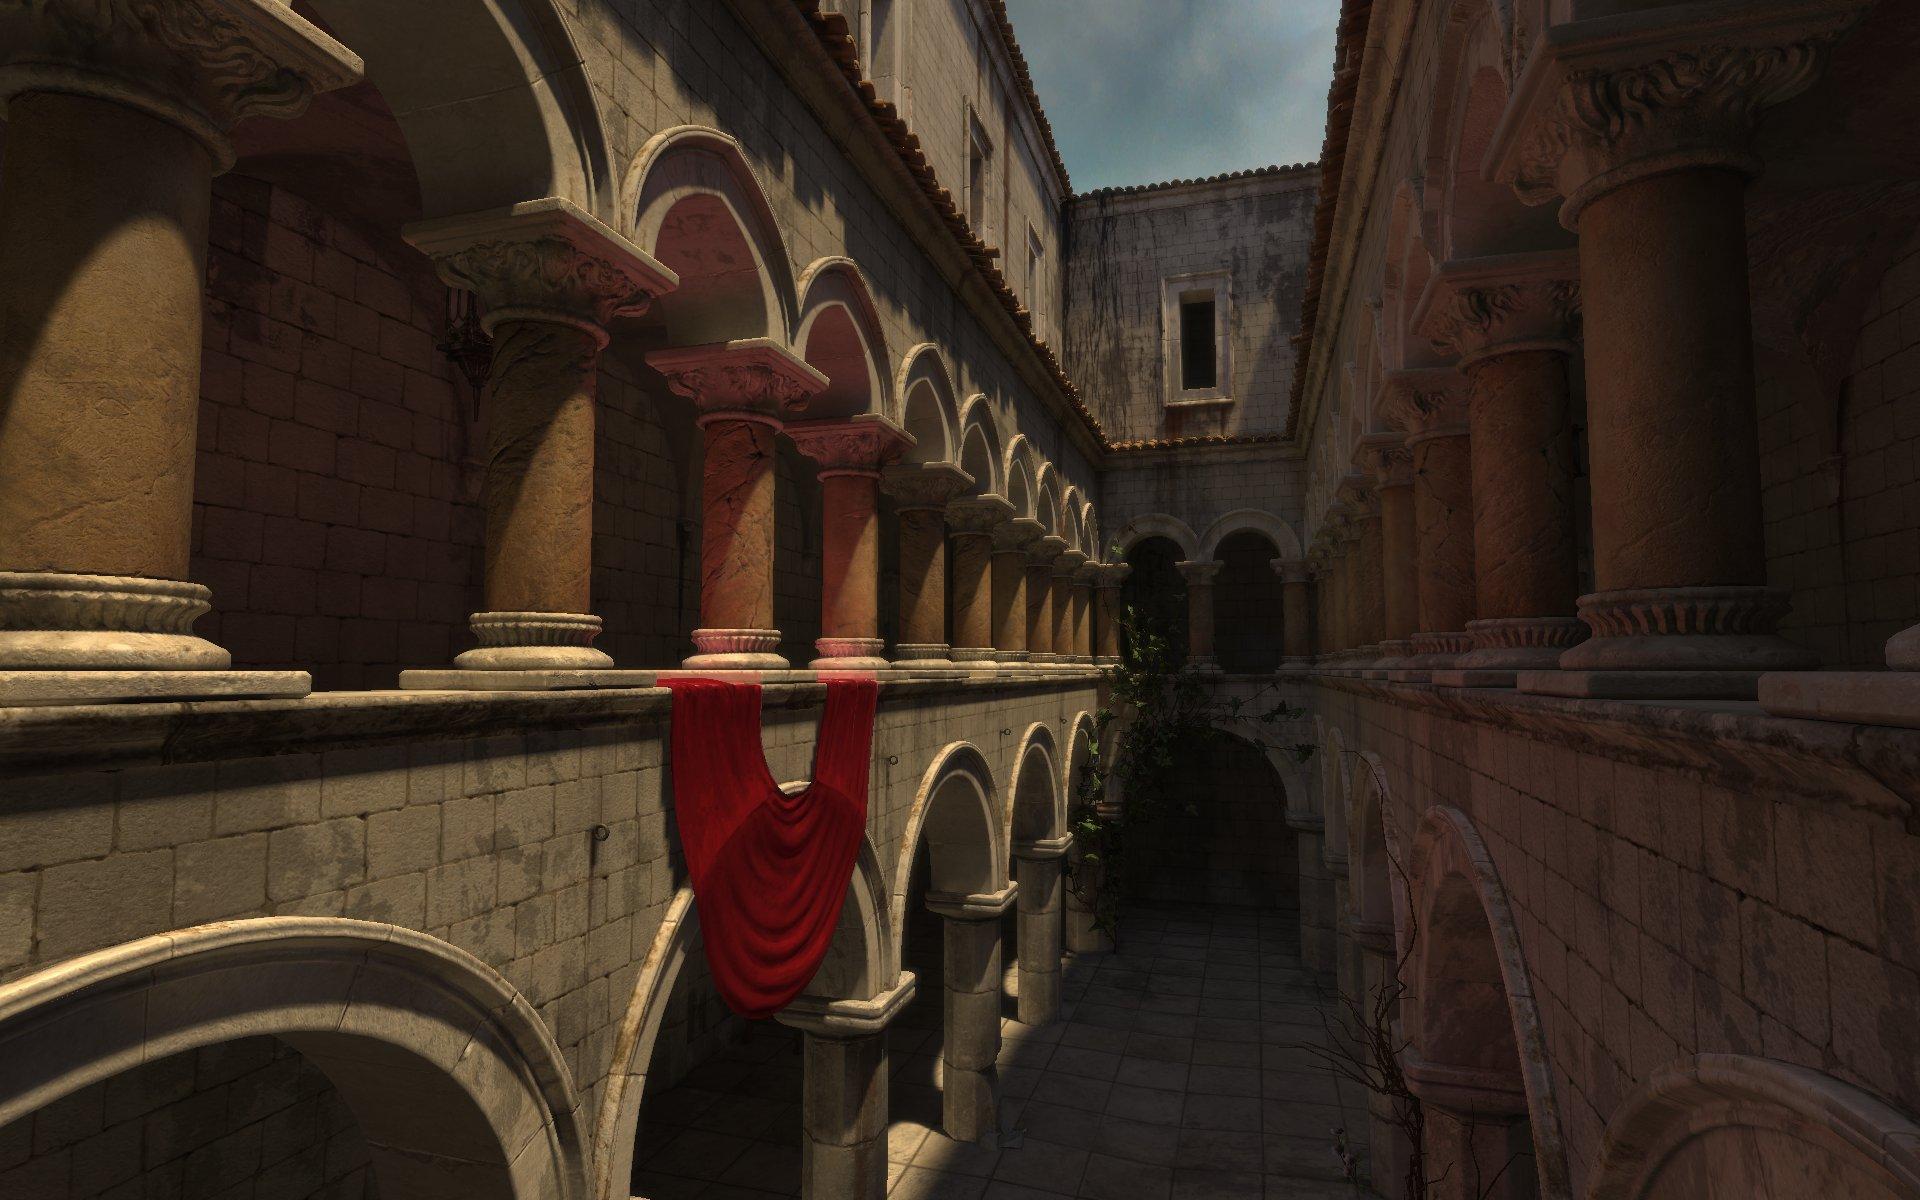 「UE3」もGIに対応。赤いカーテンの反射光が柱を赤く照らしている様に注目